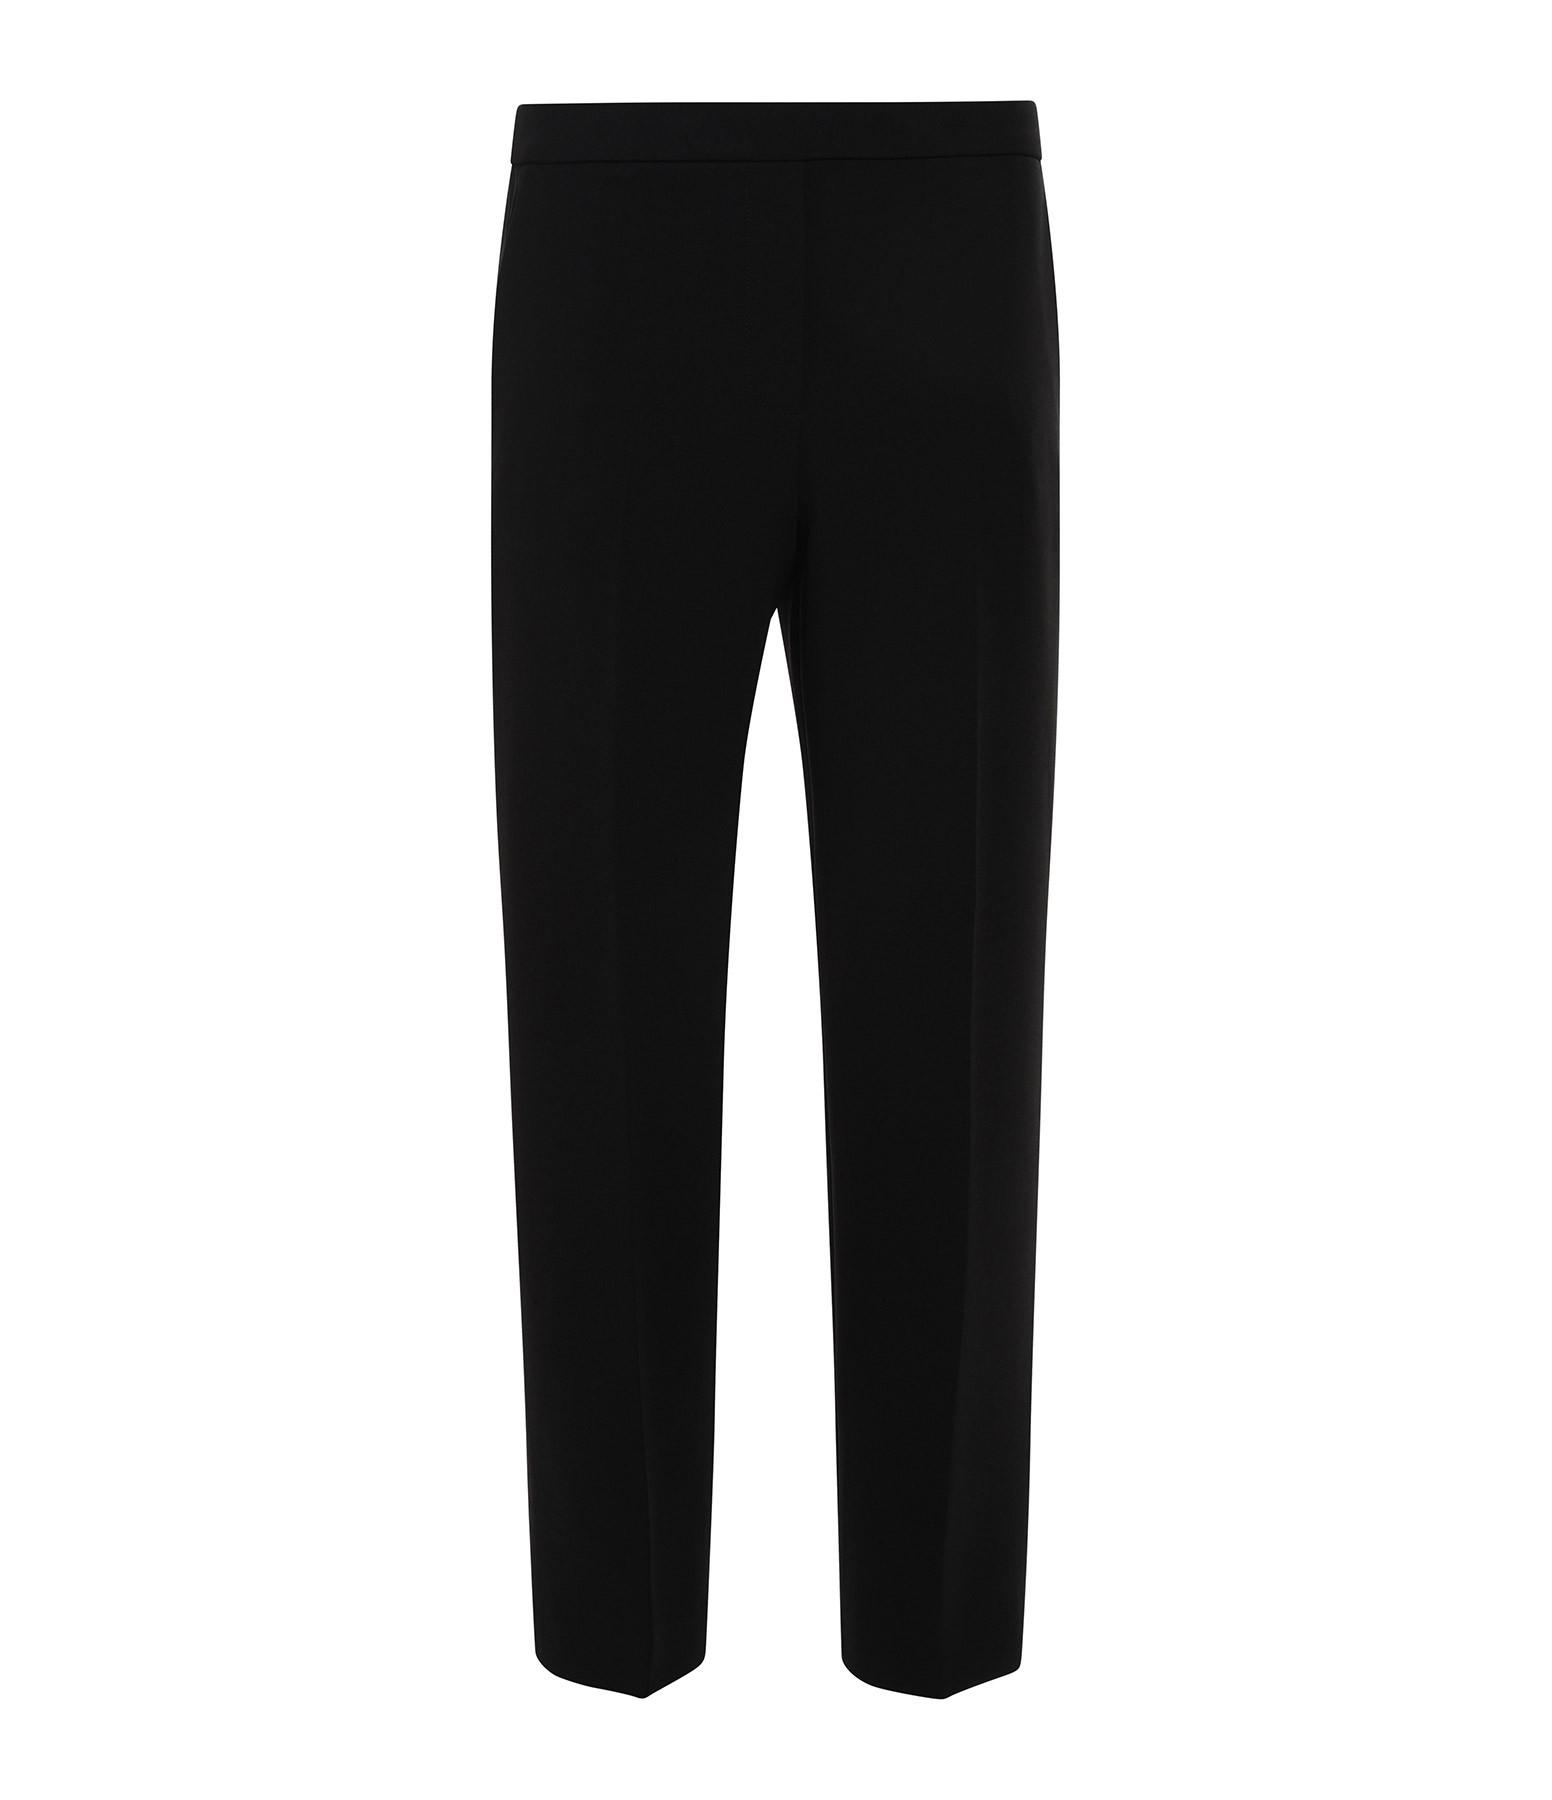 THEORY - Pantalon Treeca Noir